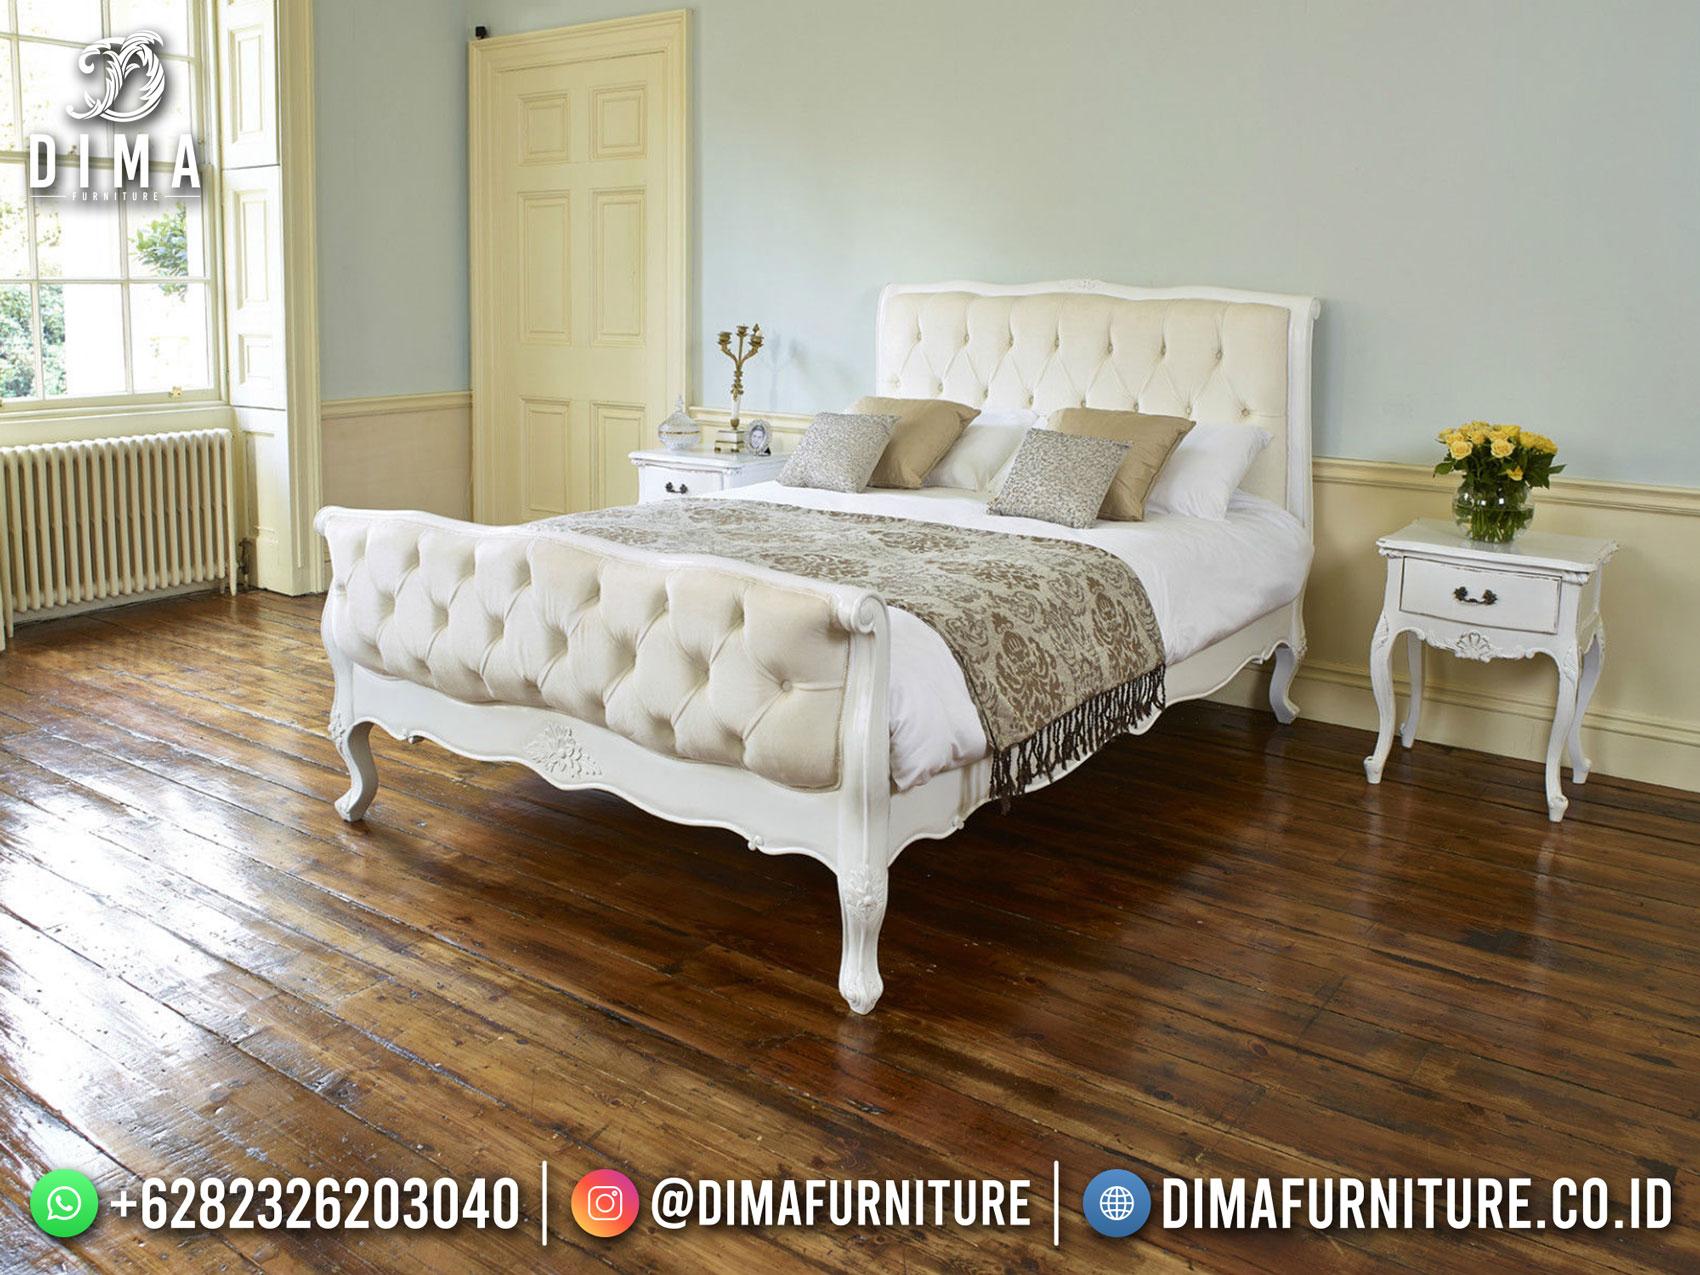 New Tempat Tidur Putih Mewah Simple Carving Luxury Style DF-1573